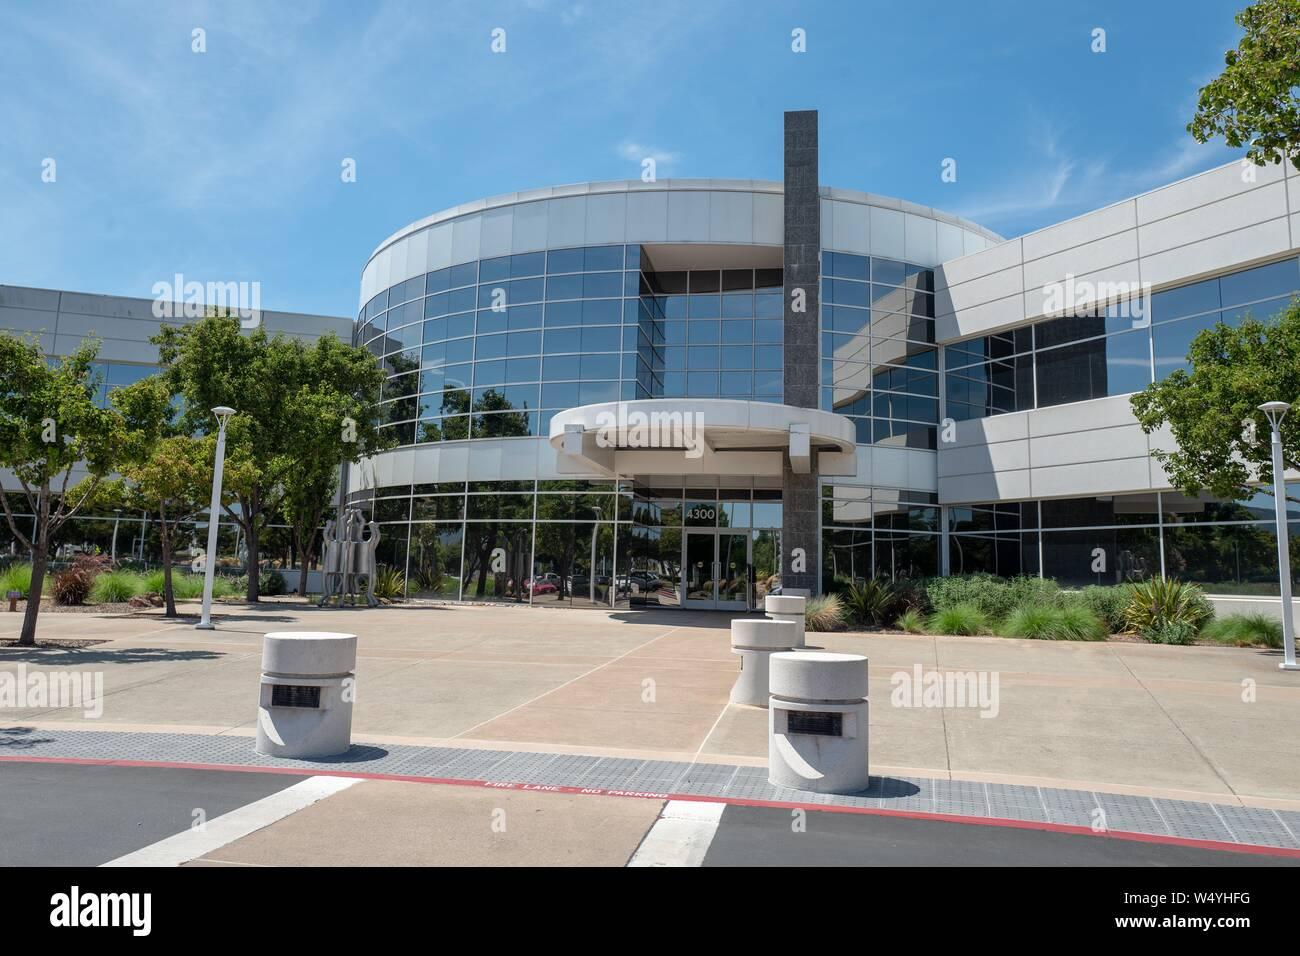 Pleasanton, California Stock Photos & Pleasanton, California